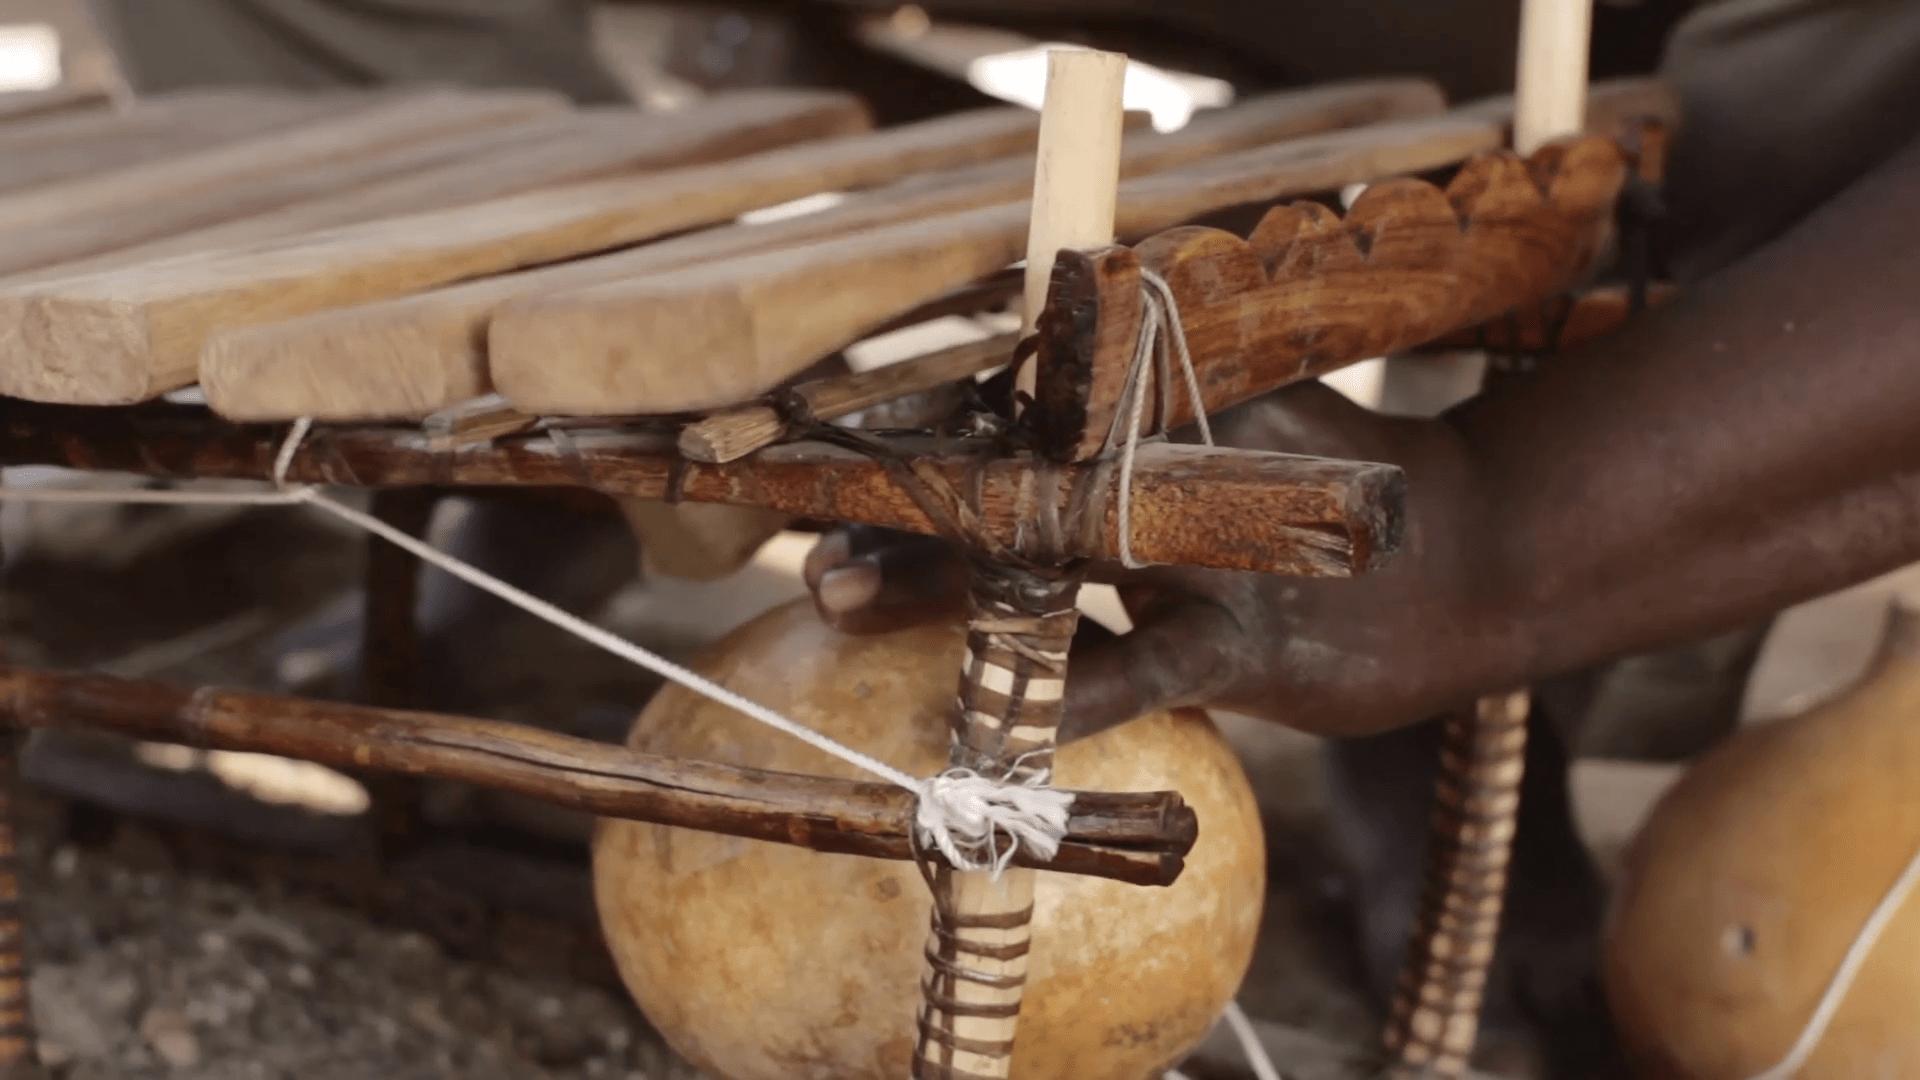 issa dembele balafon mali bandidocine - Malí 3, Ségou